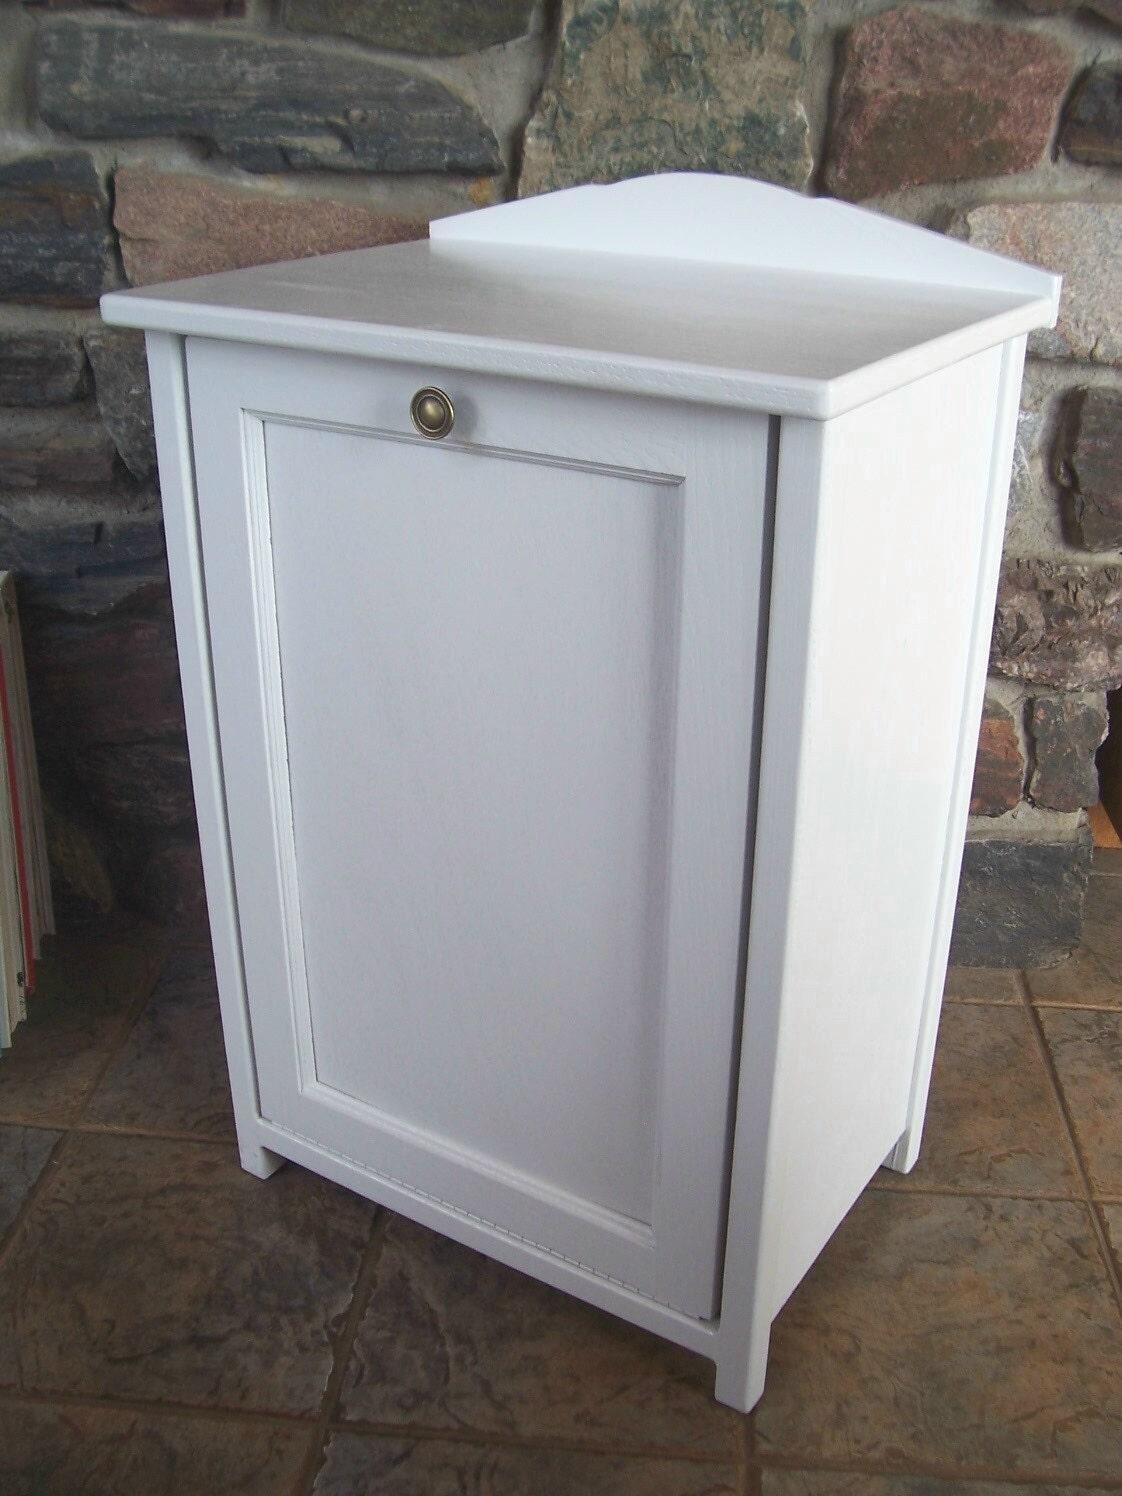 New White Wood Trash Bin Cabinet Tilt Door Garbage Can